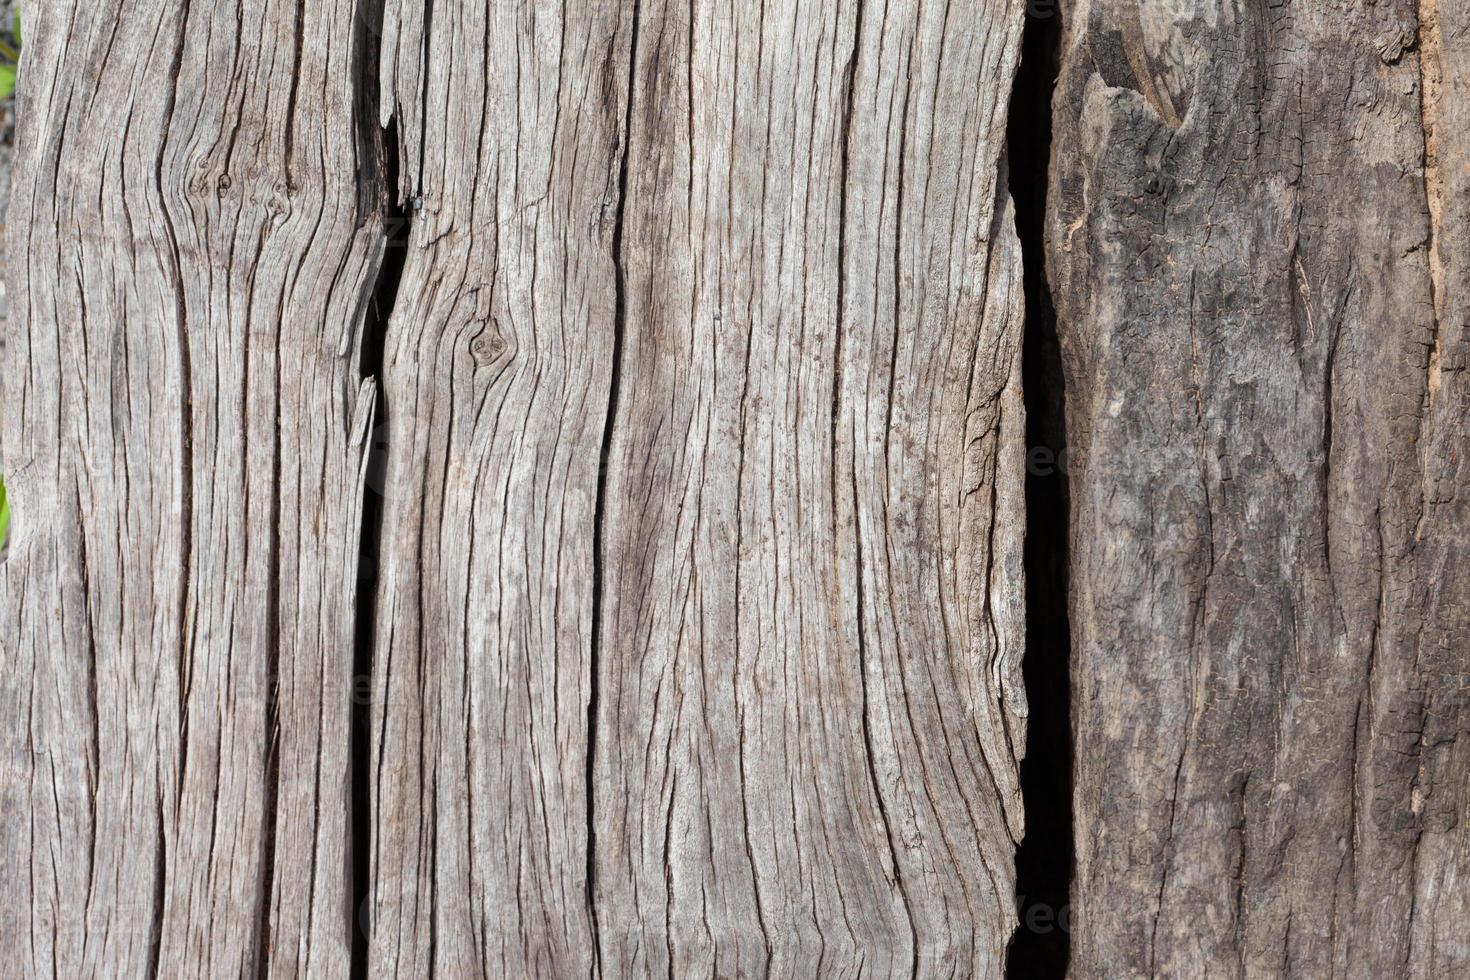 oud, grunge houten panelen die als achtergrond worden gebruikt foto